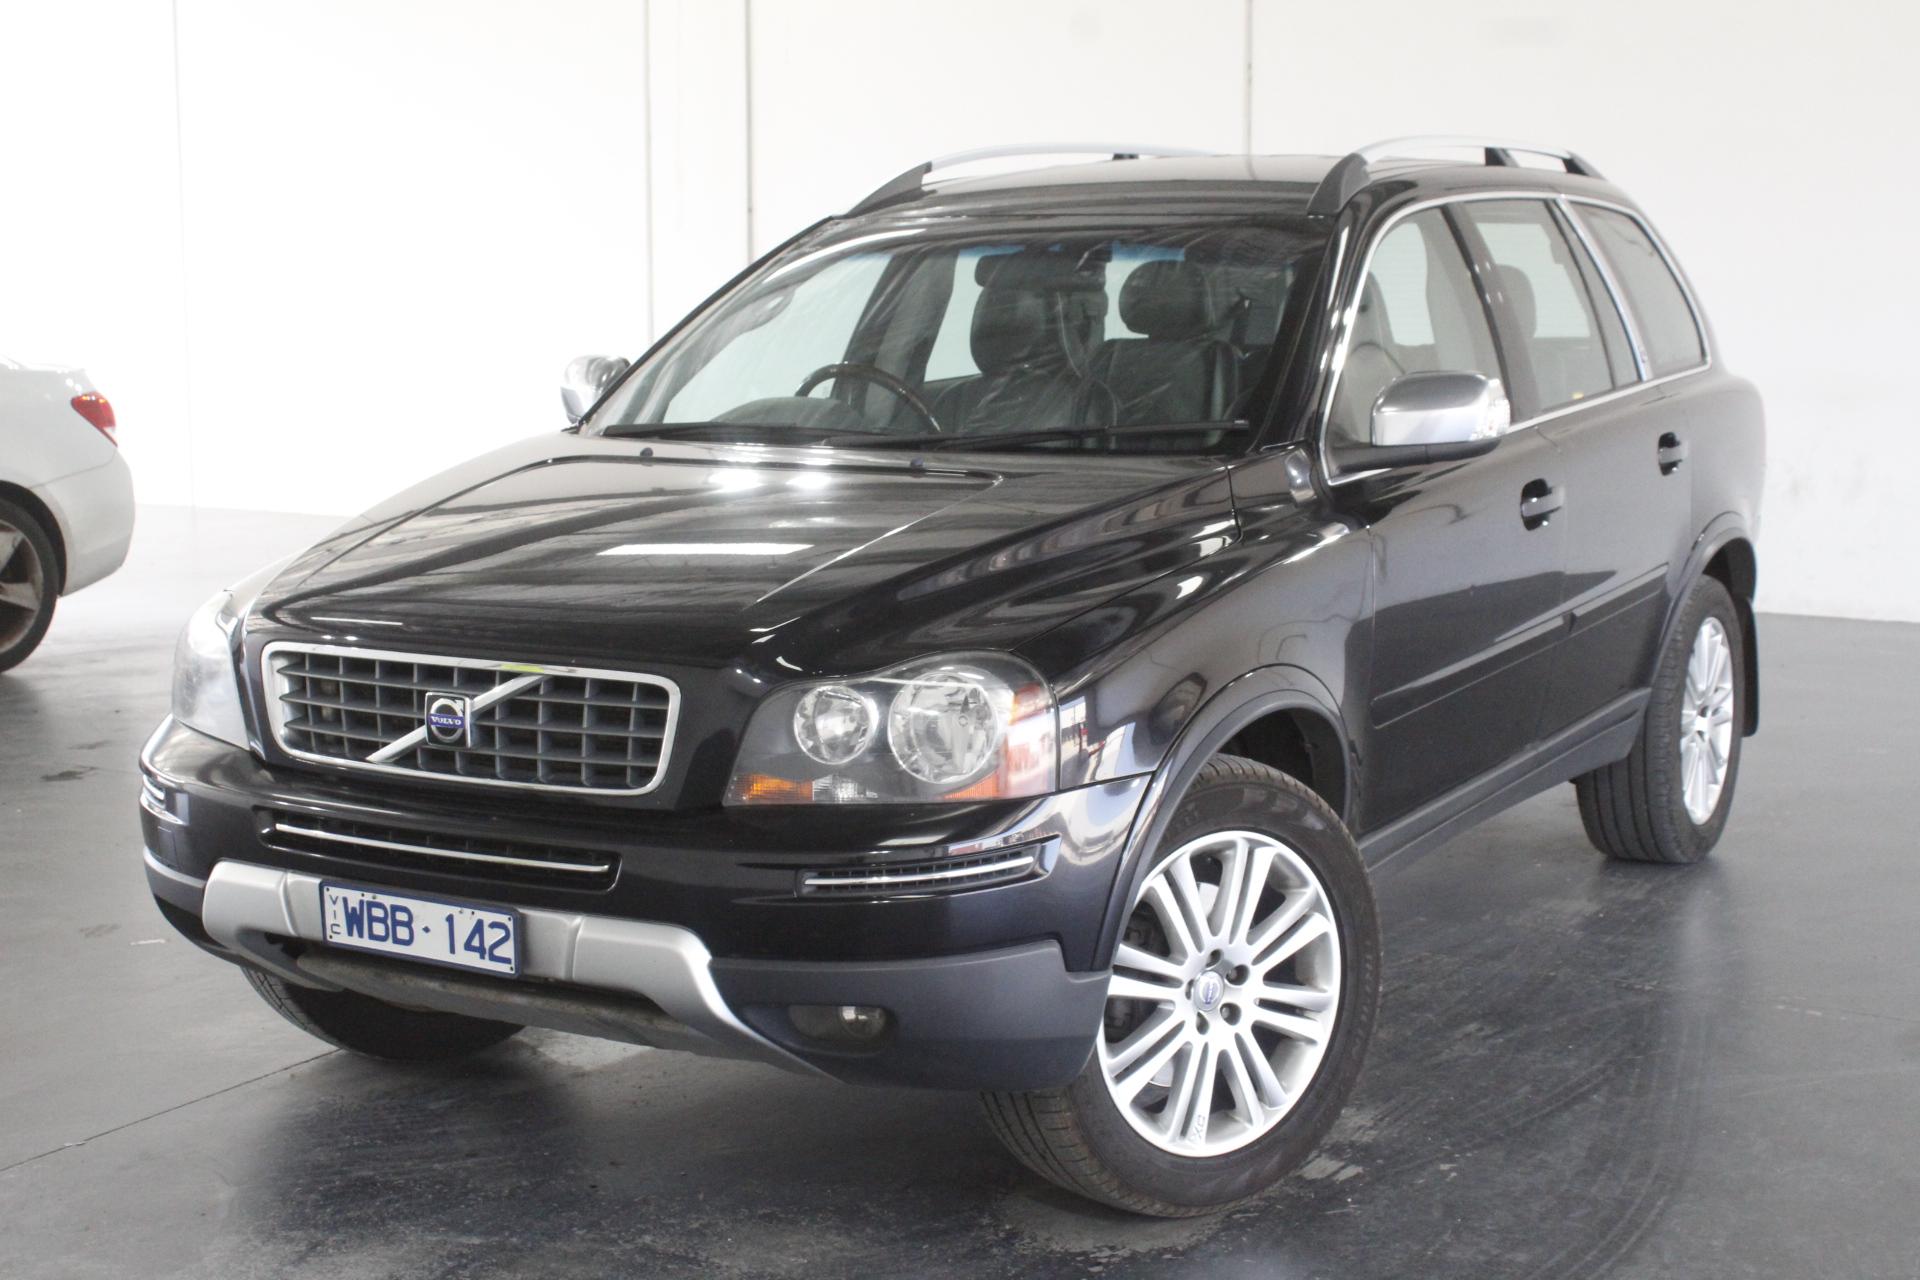 2007 Volvo XC90 D5 Executive Turbo Diesel Automatic 7 Seats Wagon